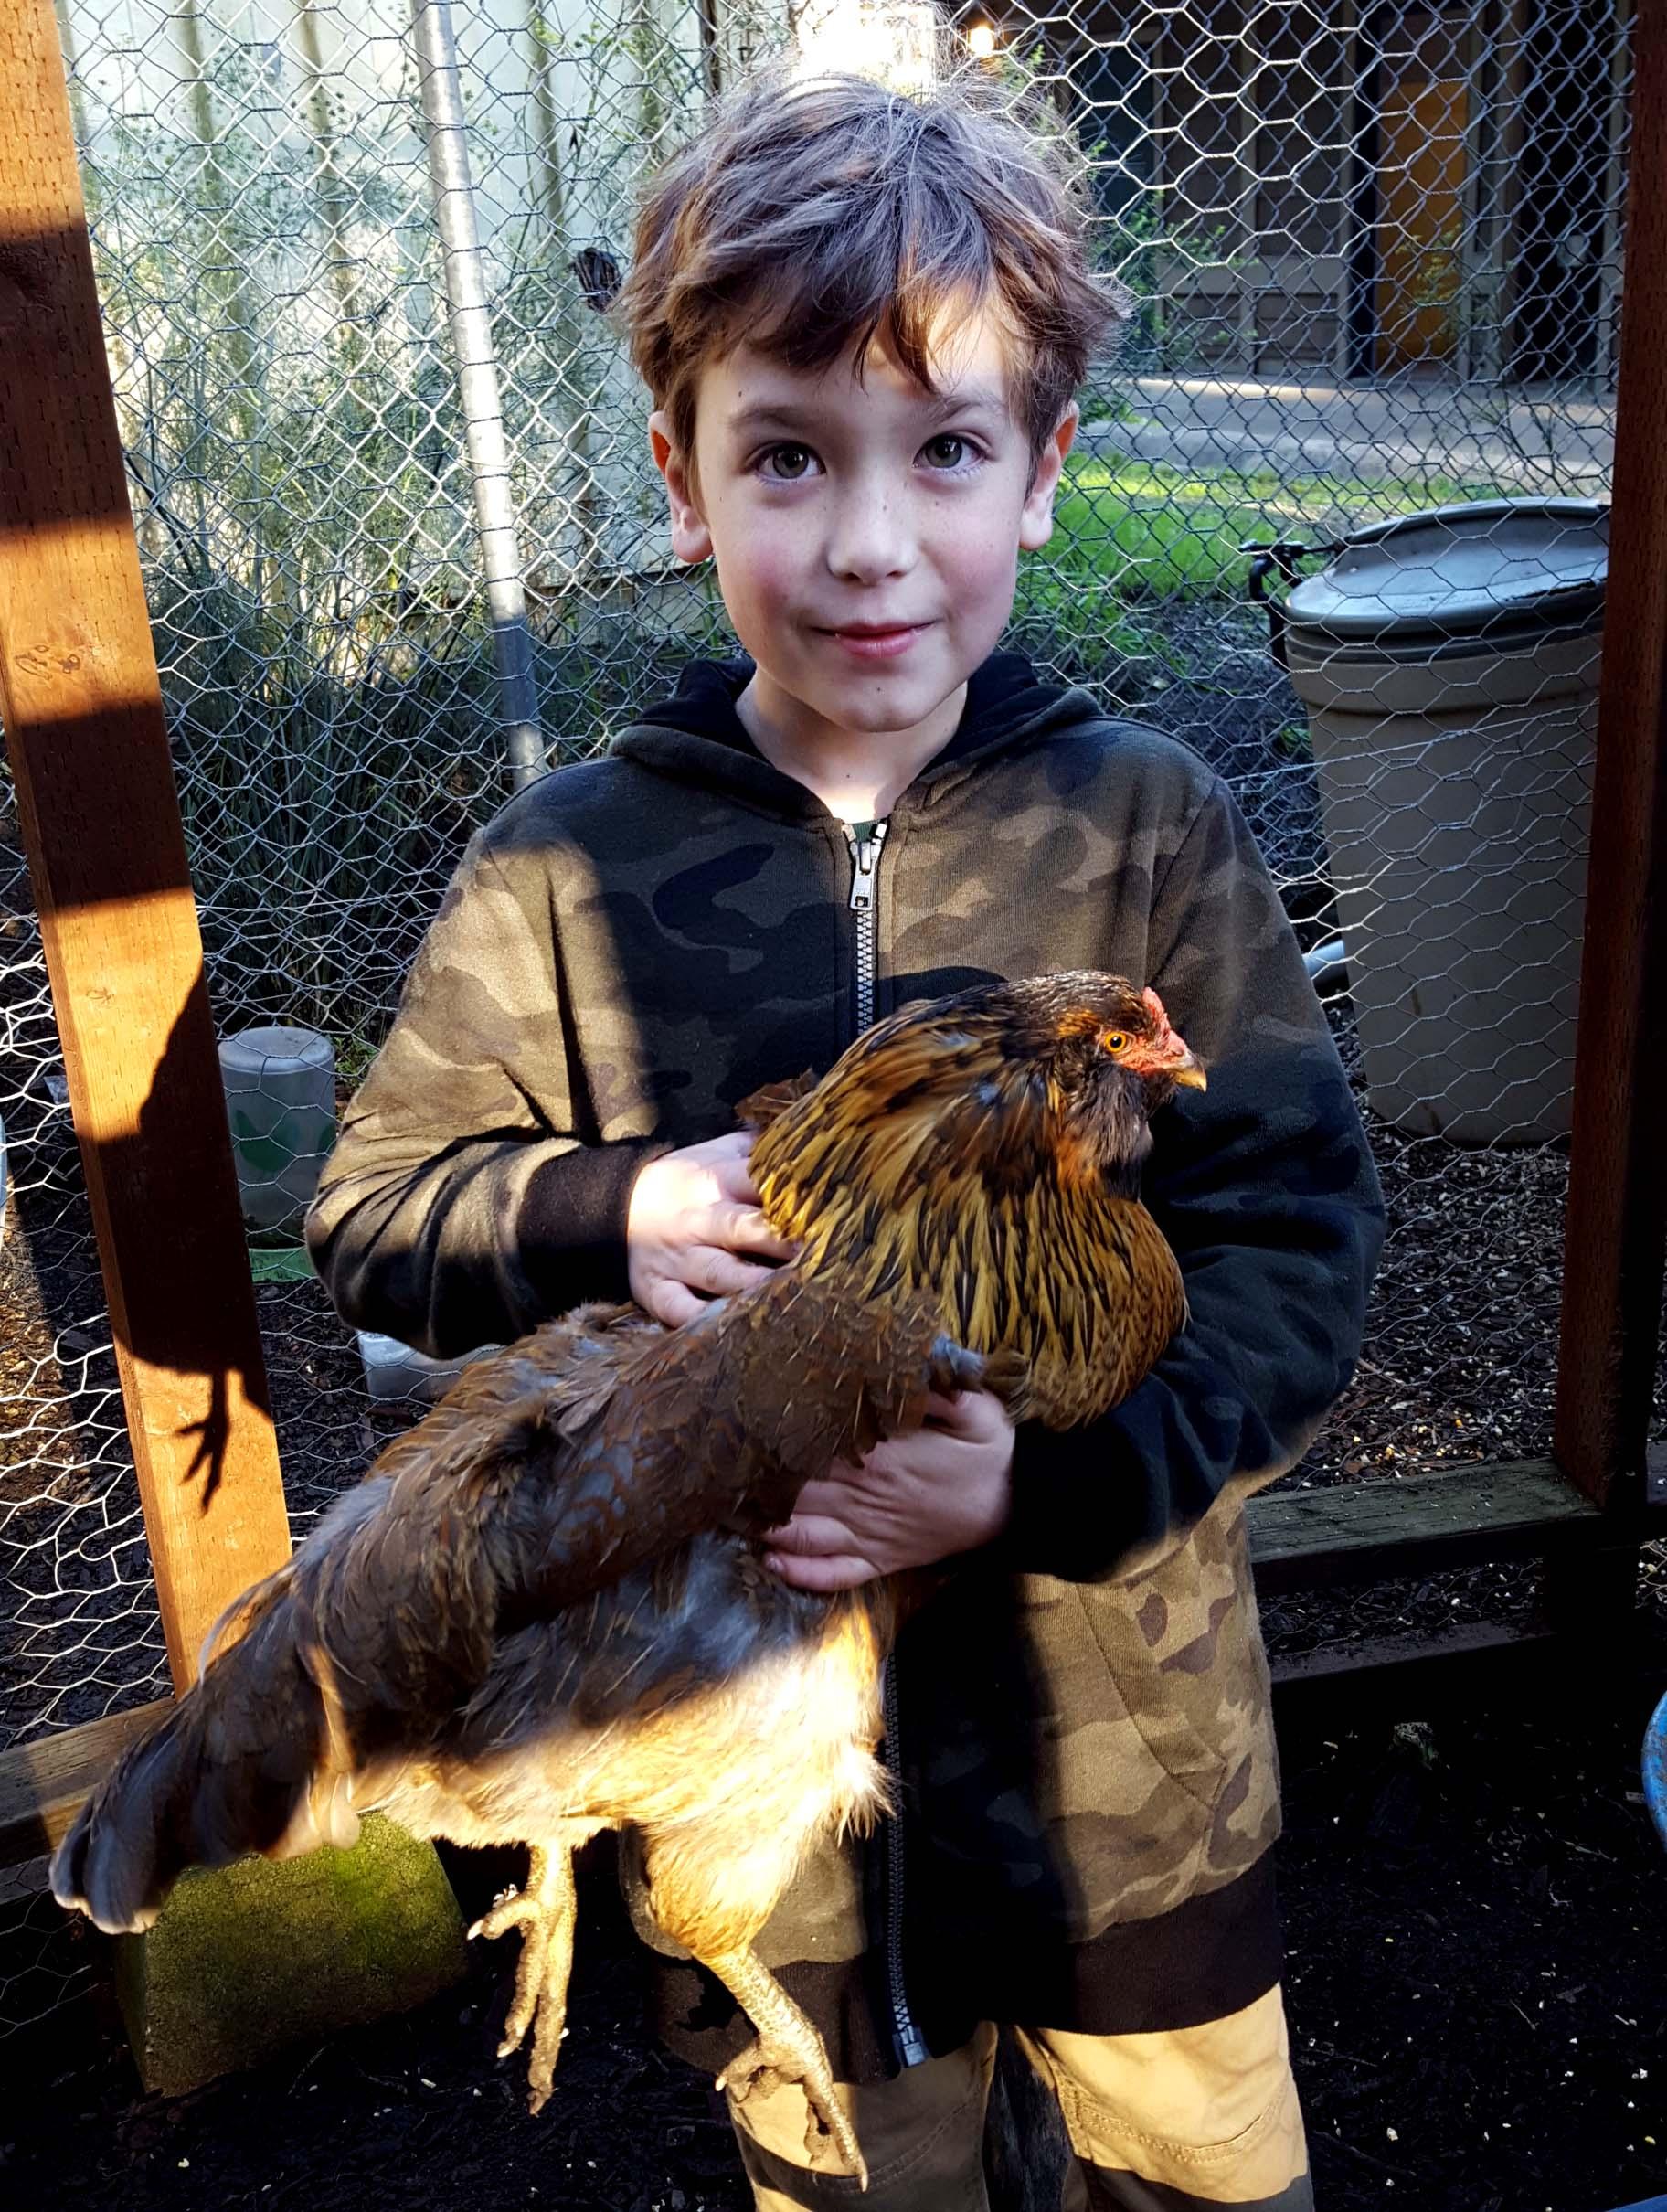 chickens_rocket_dean_edited